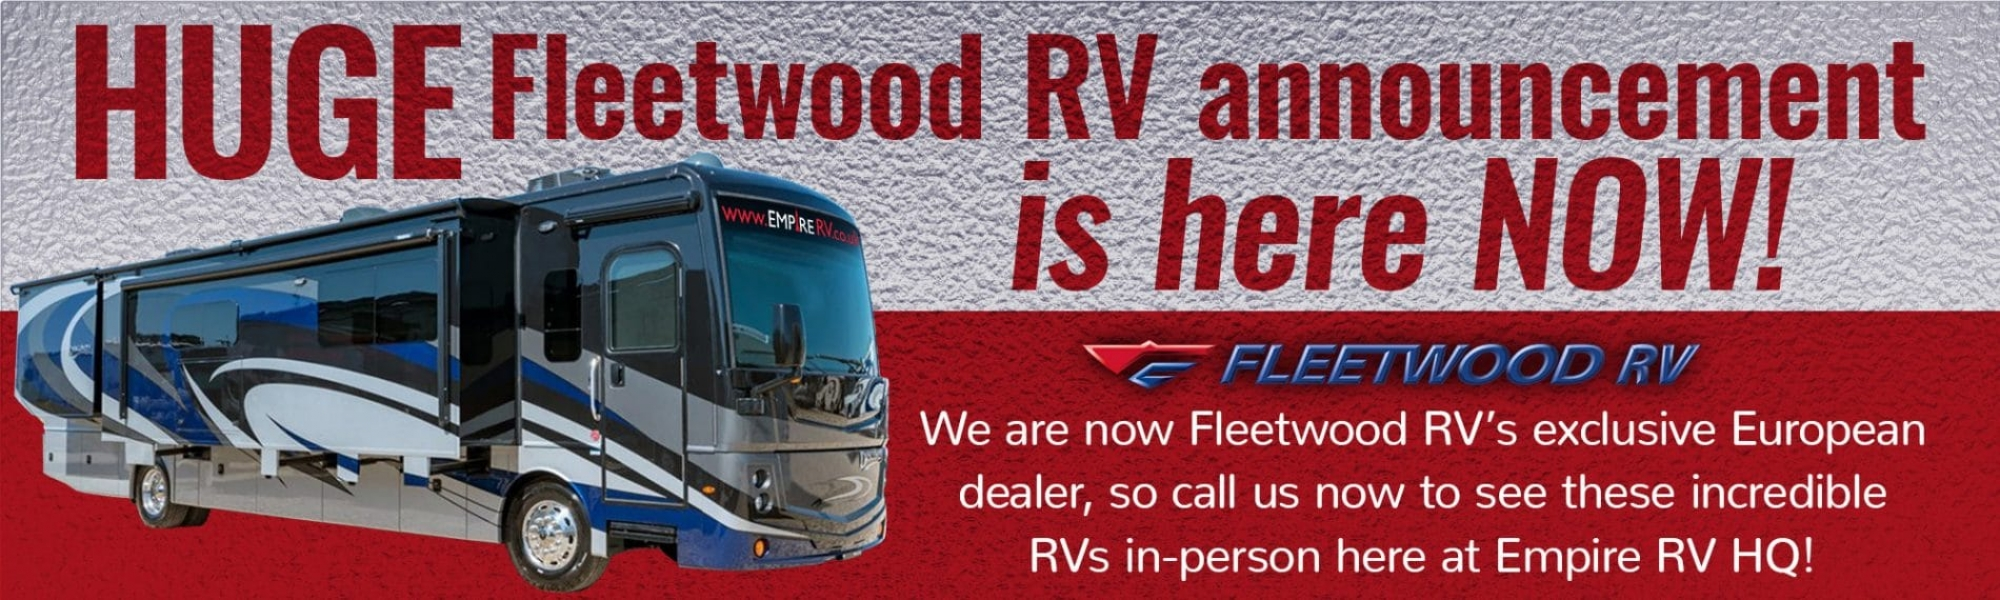 Empire RV Fleetwood RV American Motorhome UK Europe dealership